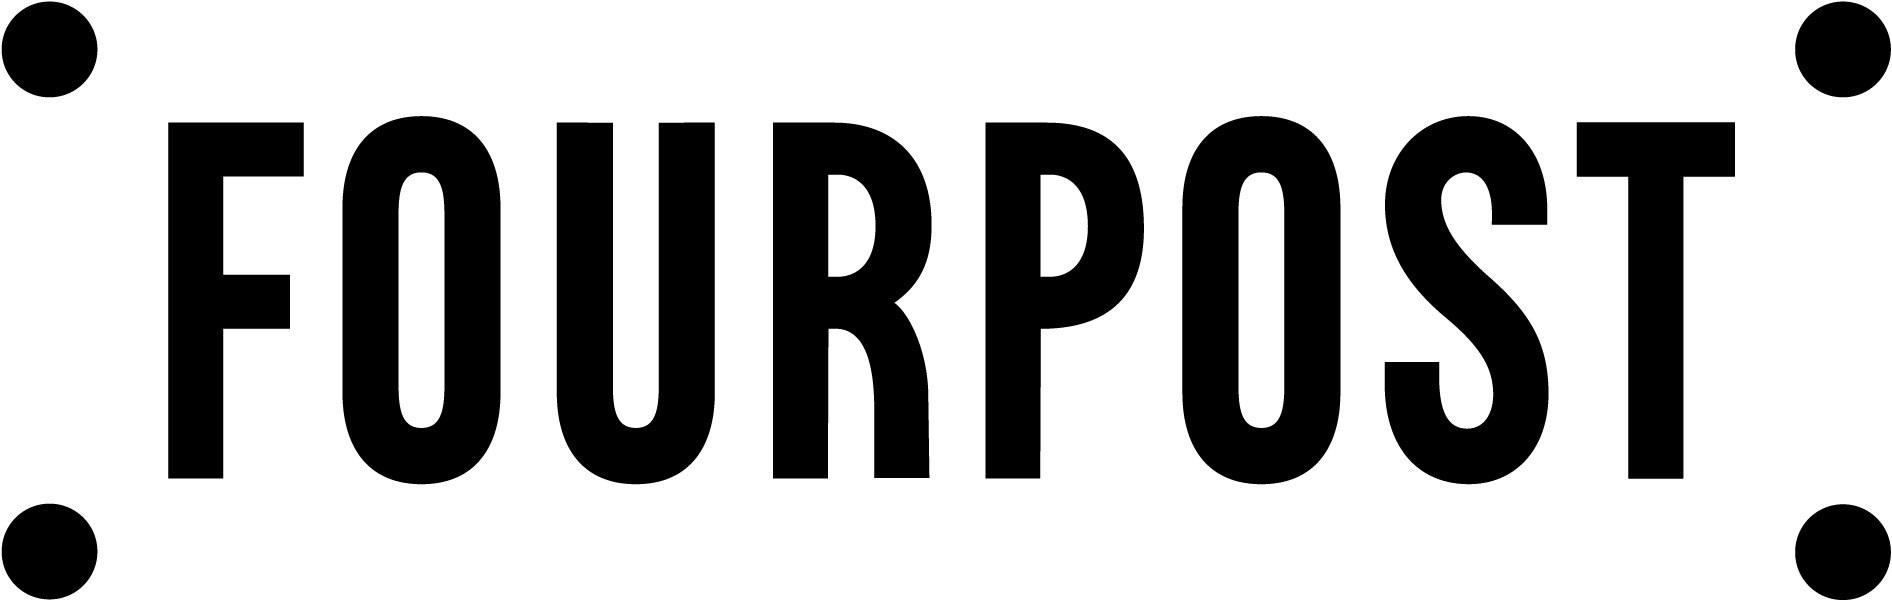 fourspotSQ.jpg